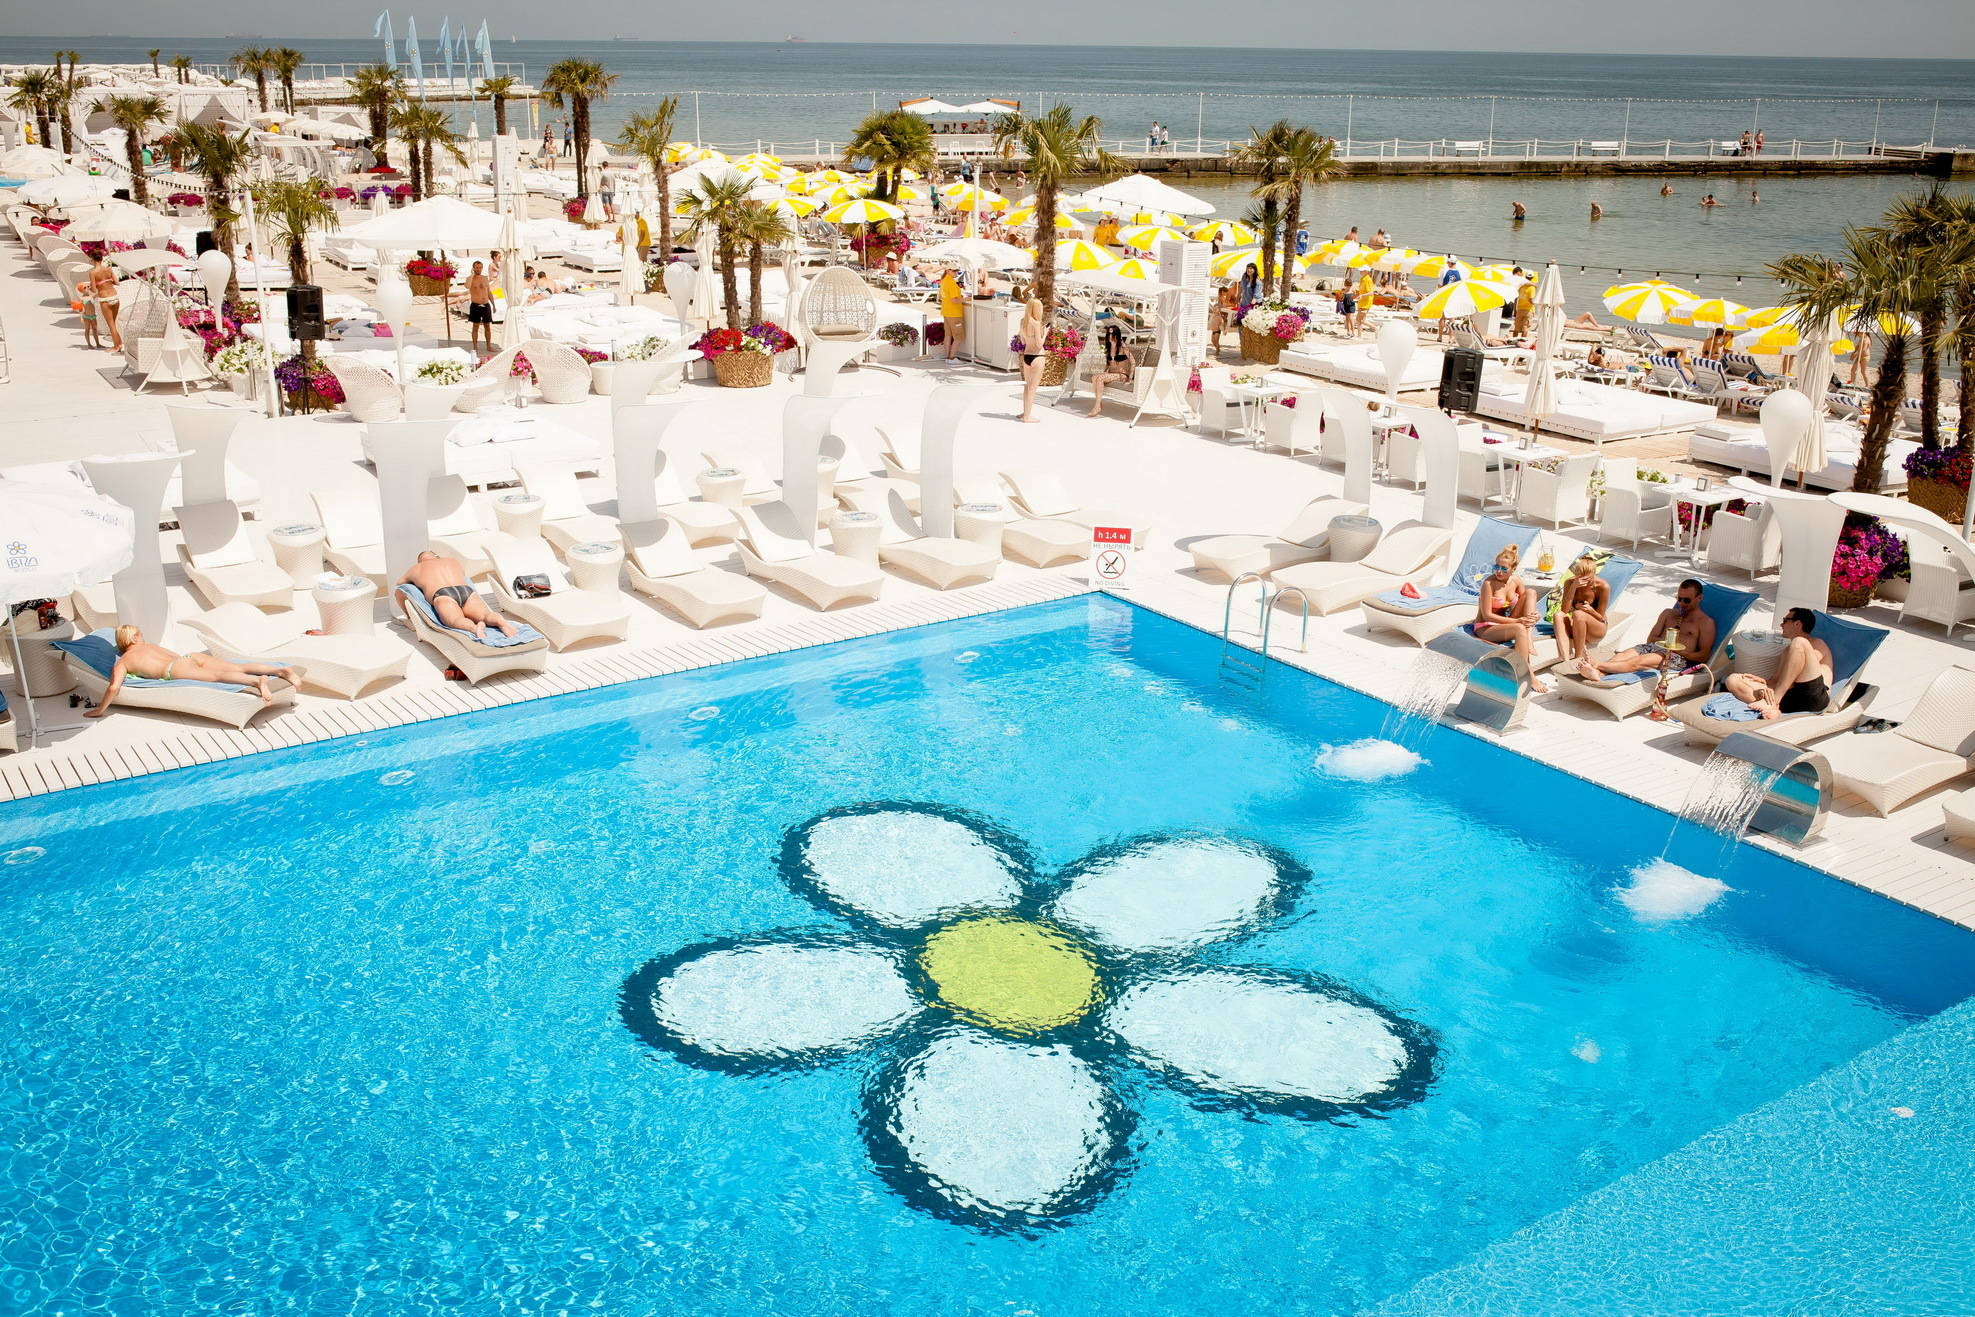 IBIZA BEACH - пляж клуба Ибица в Одессе